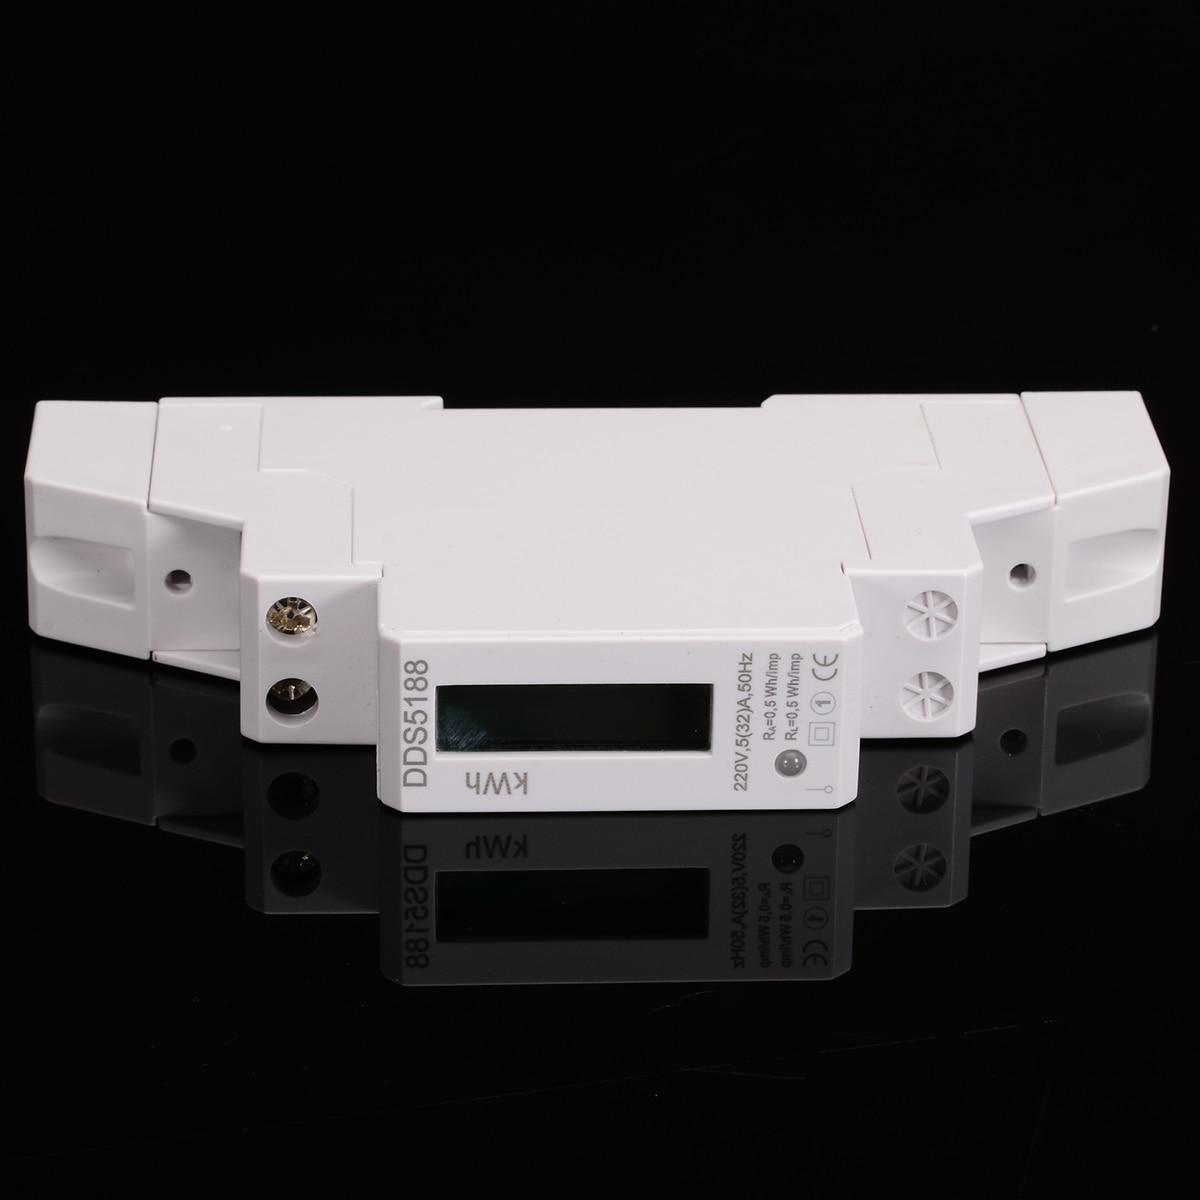 DDS5188 LCD 5(32)A 230V AC Single Phase Pole DIN-Rail Kilowatt Hour kwh Meter Energy Power Meter Digital LED Display